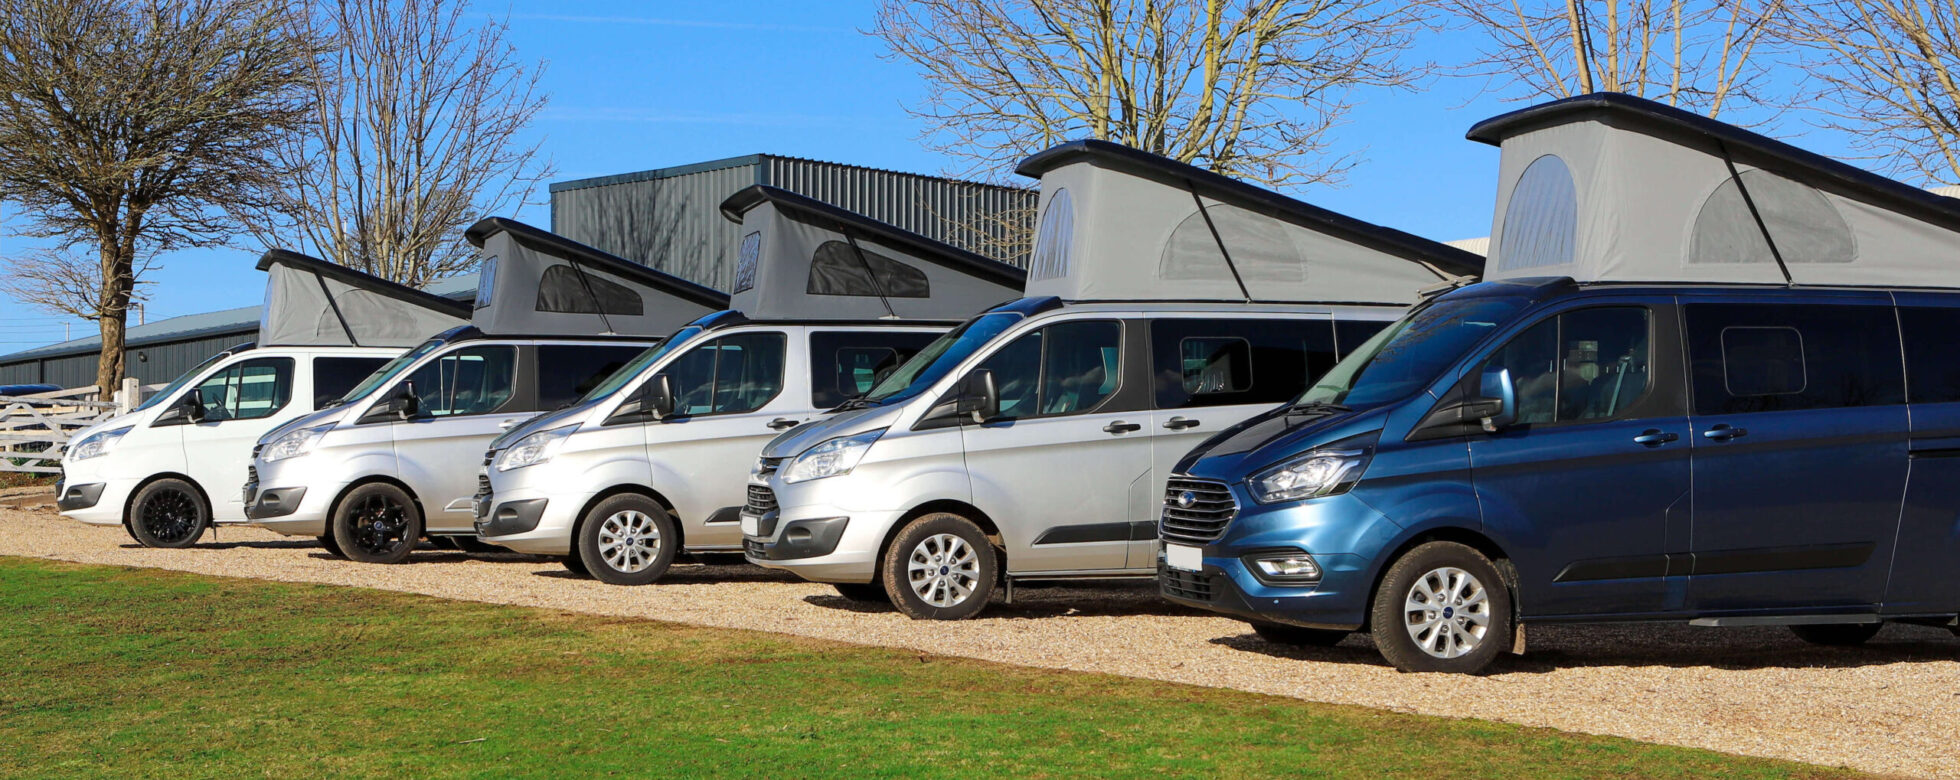 Somerset Campervan Company